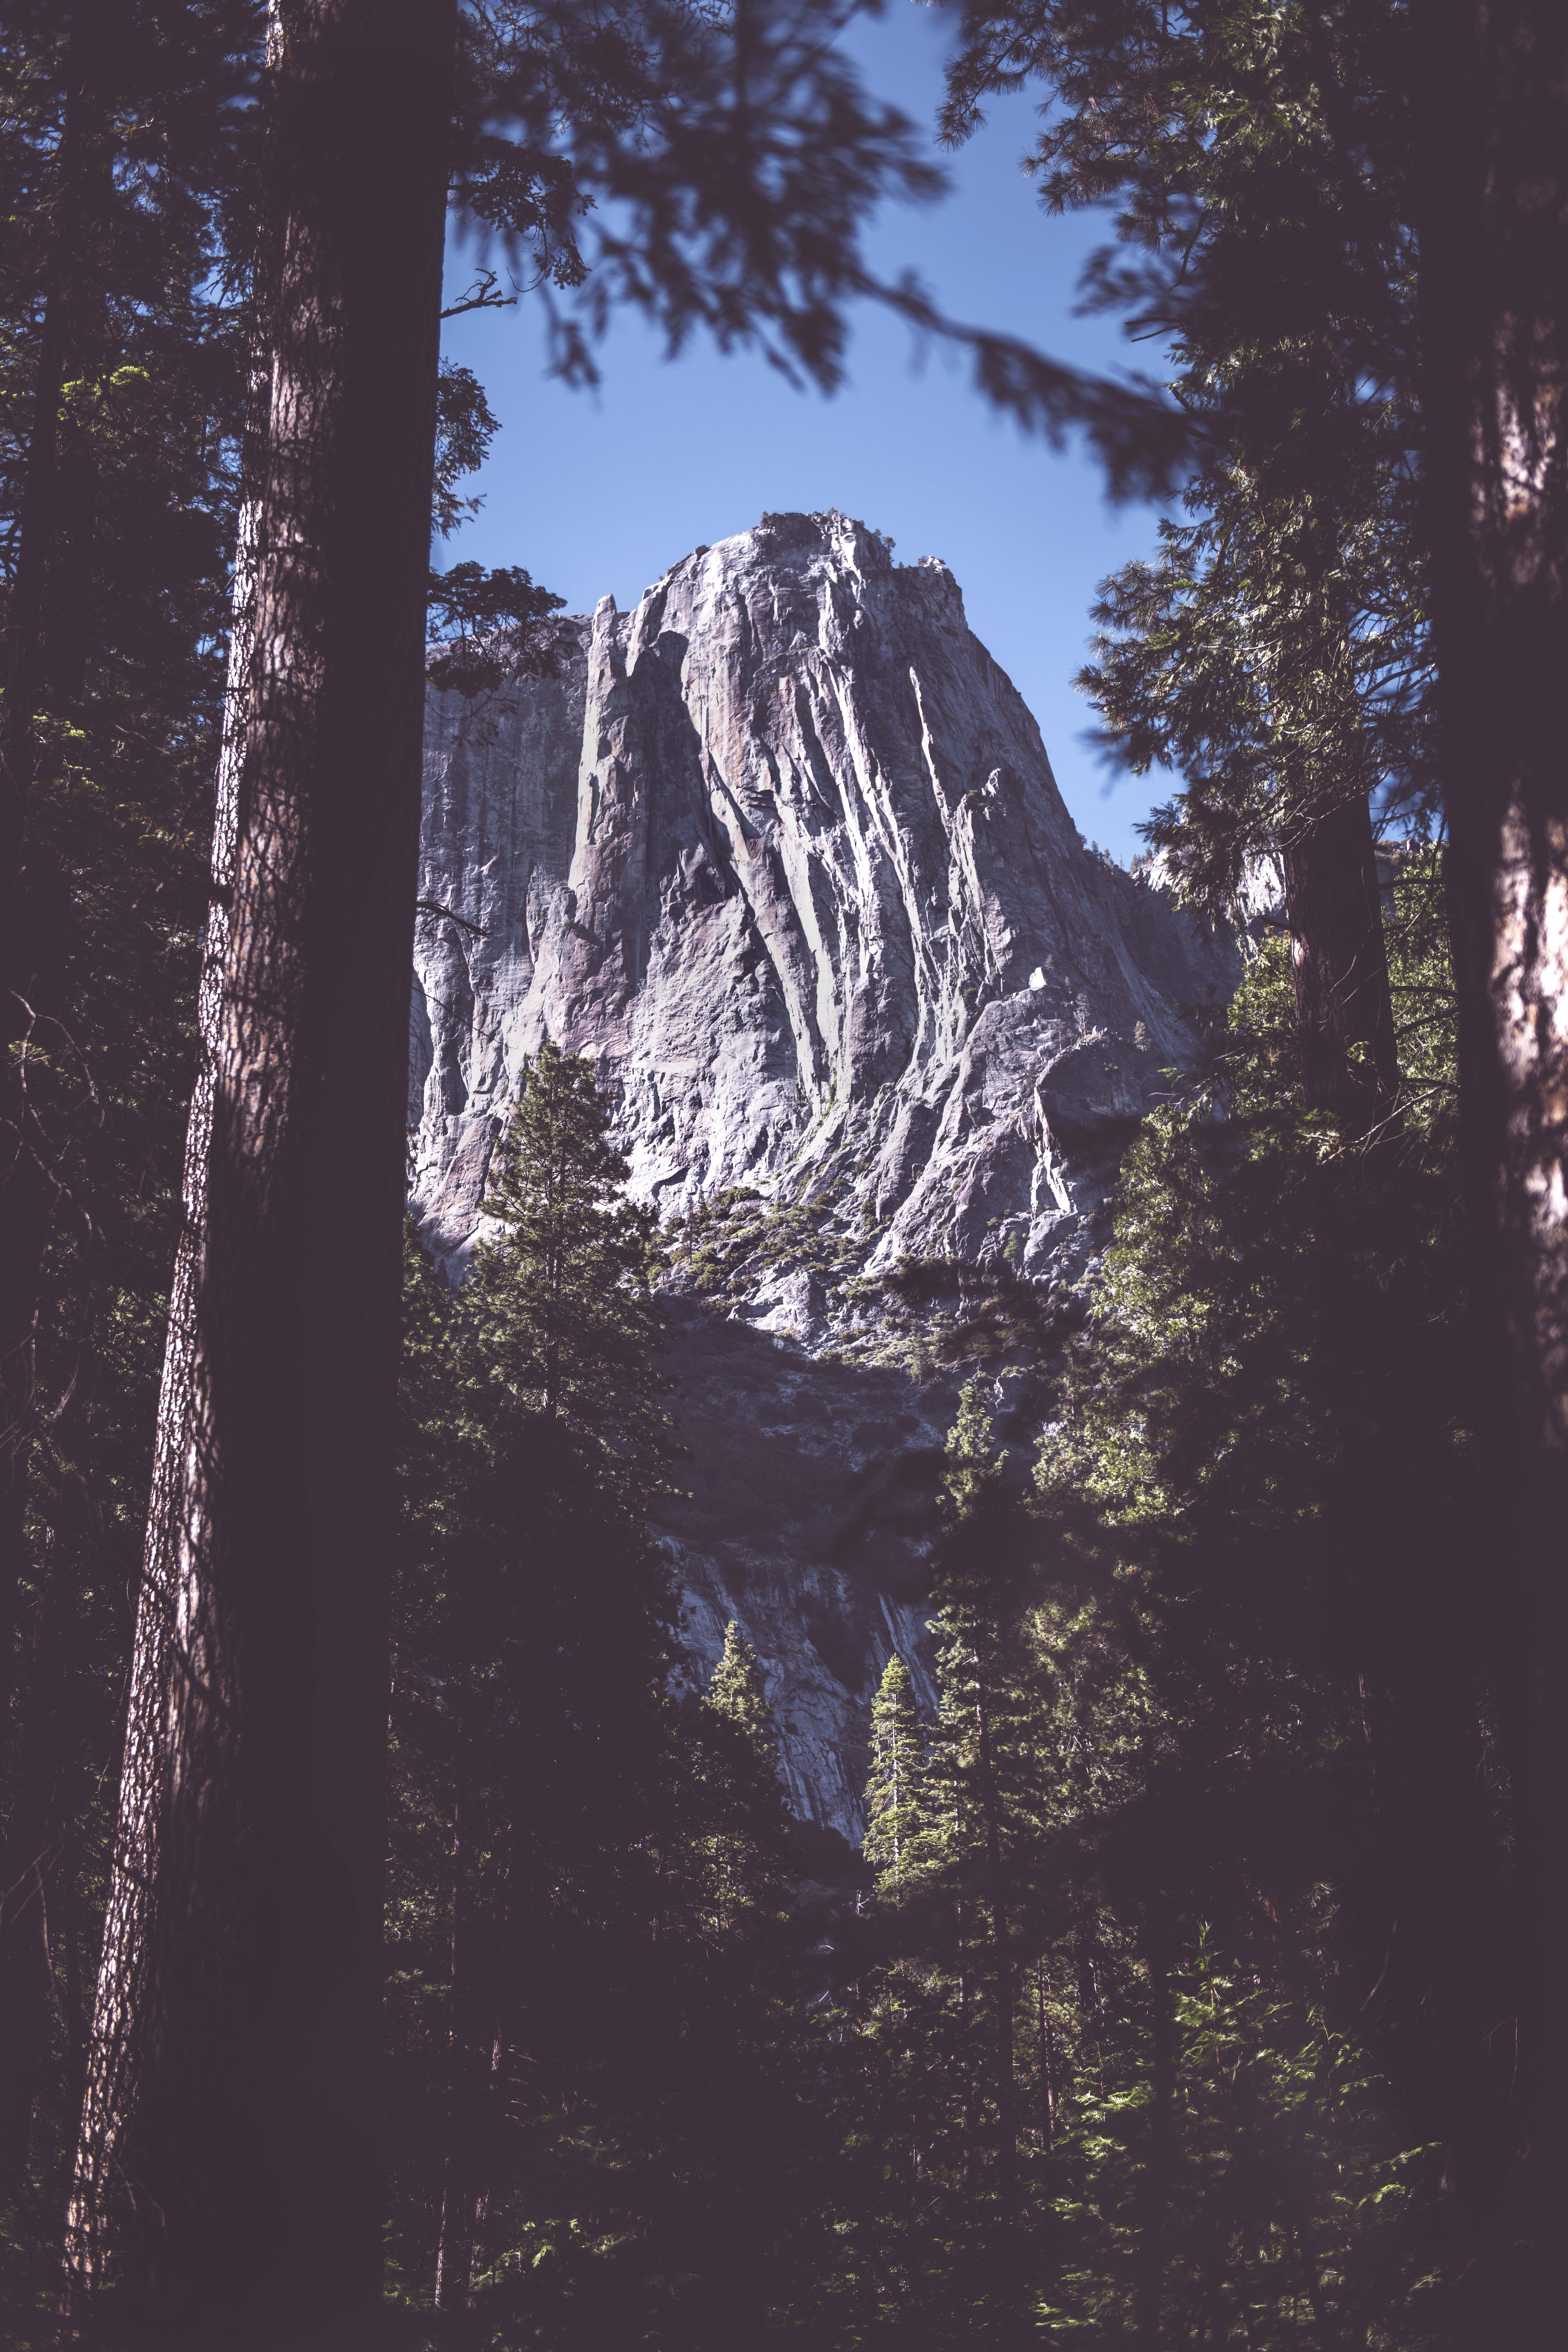 Gray Mountain Near Green Forest